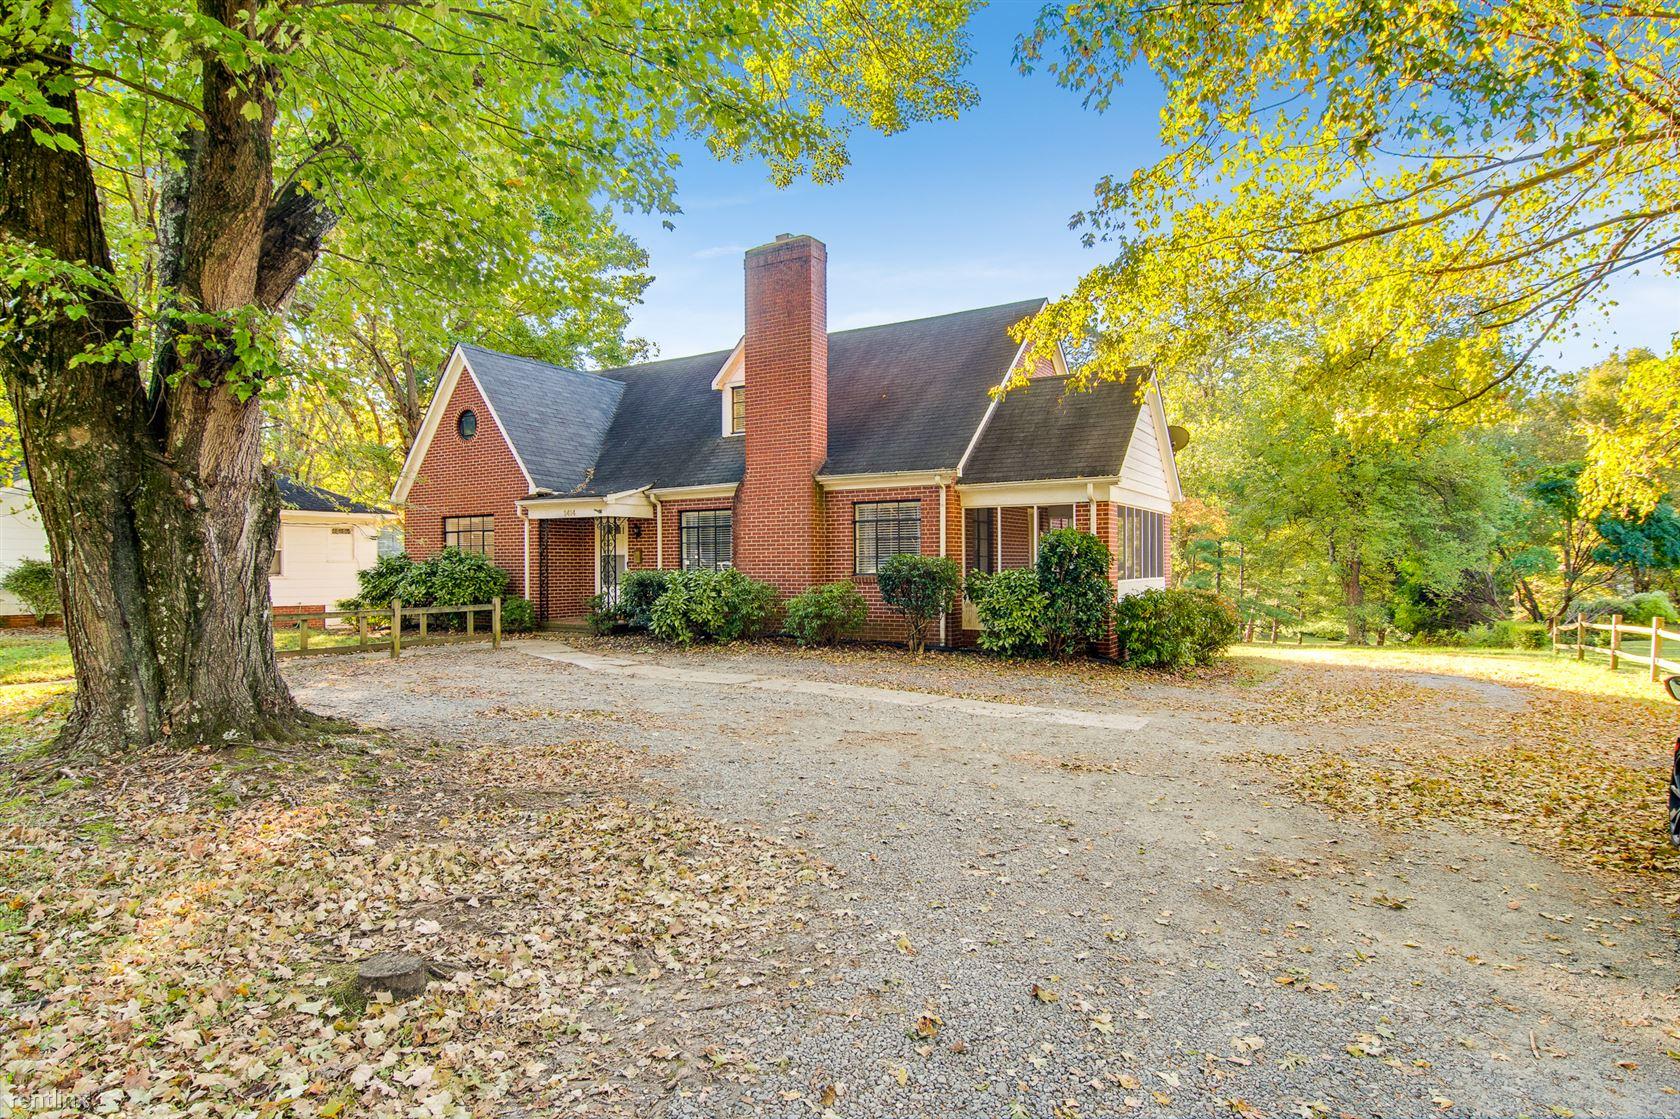 1414 Polo Rd, Winston Salem, NC - $2,400